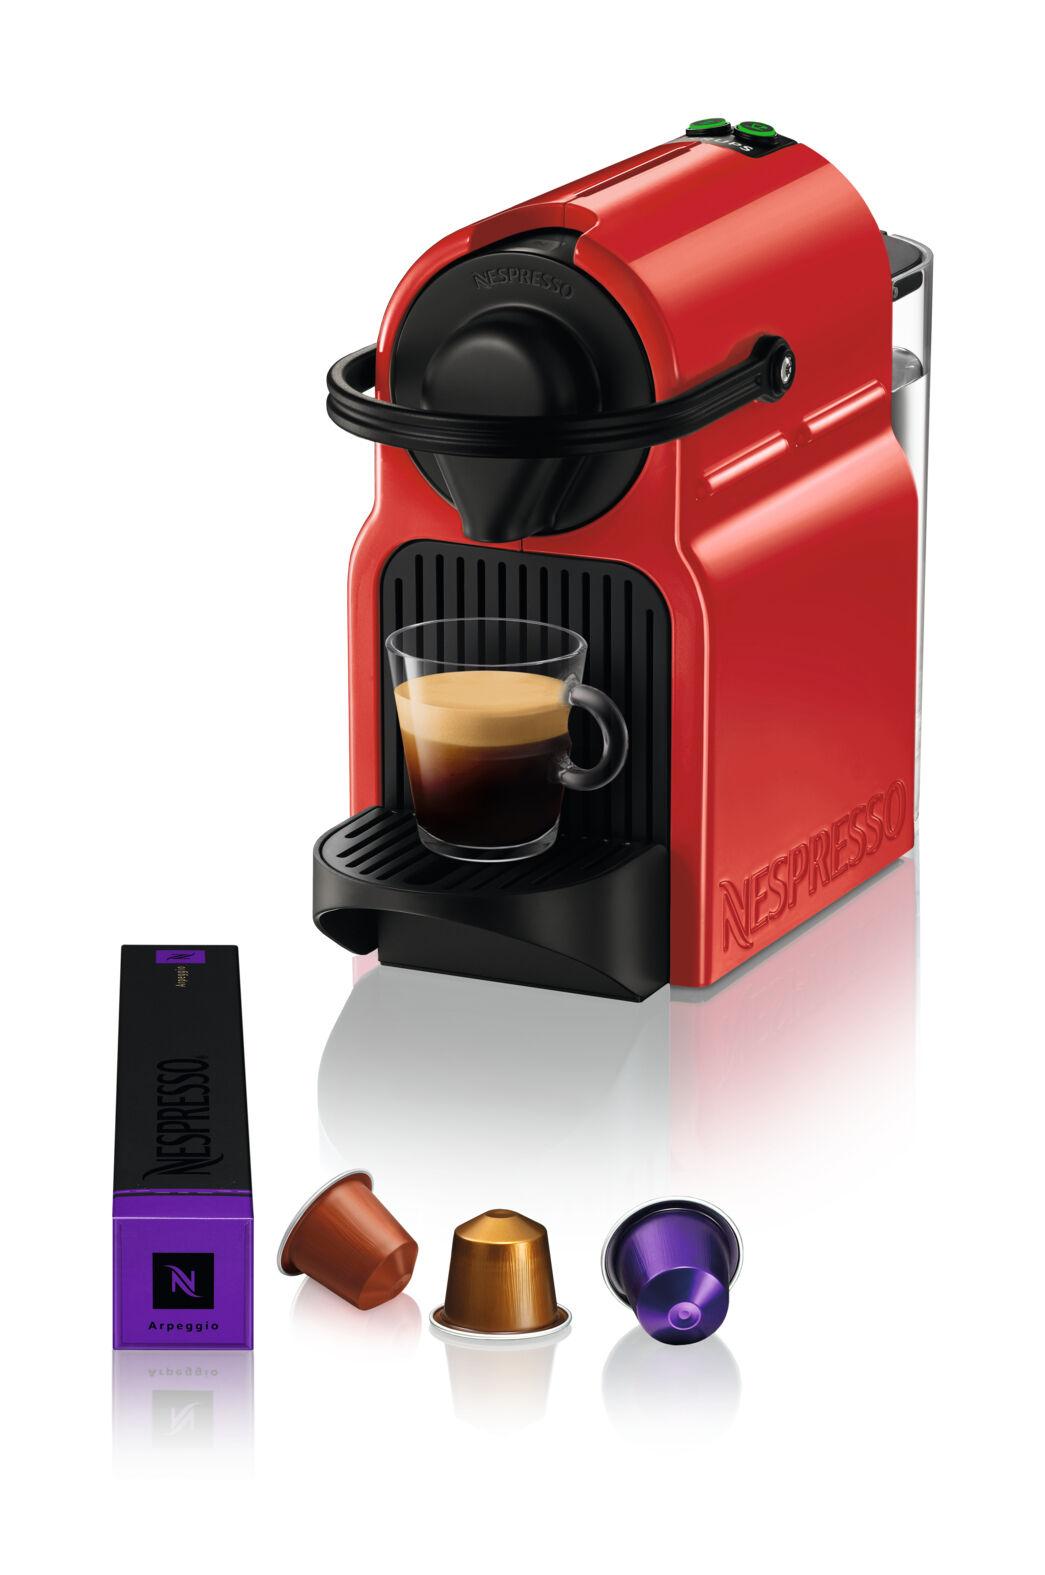 Krups Inissia Macchina per caffé espresso, a capsule, 1260 W, 0.7 L, Rosso